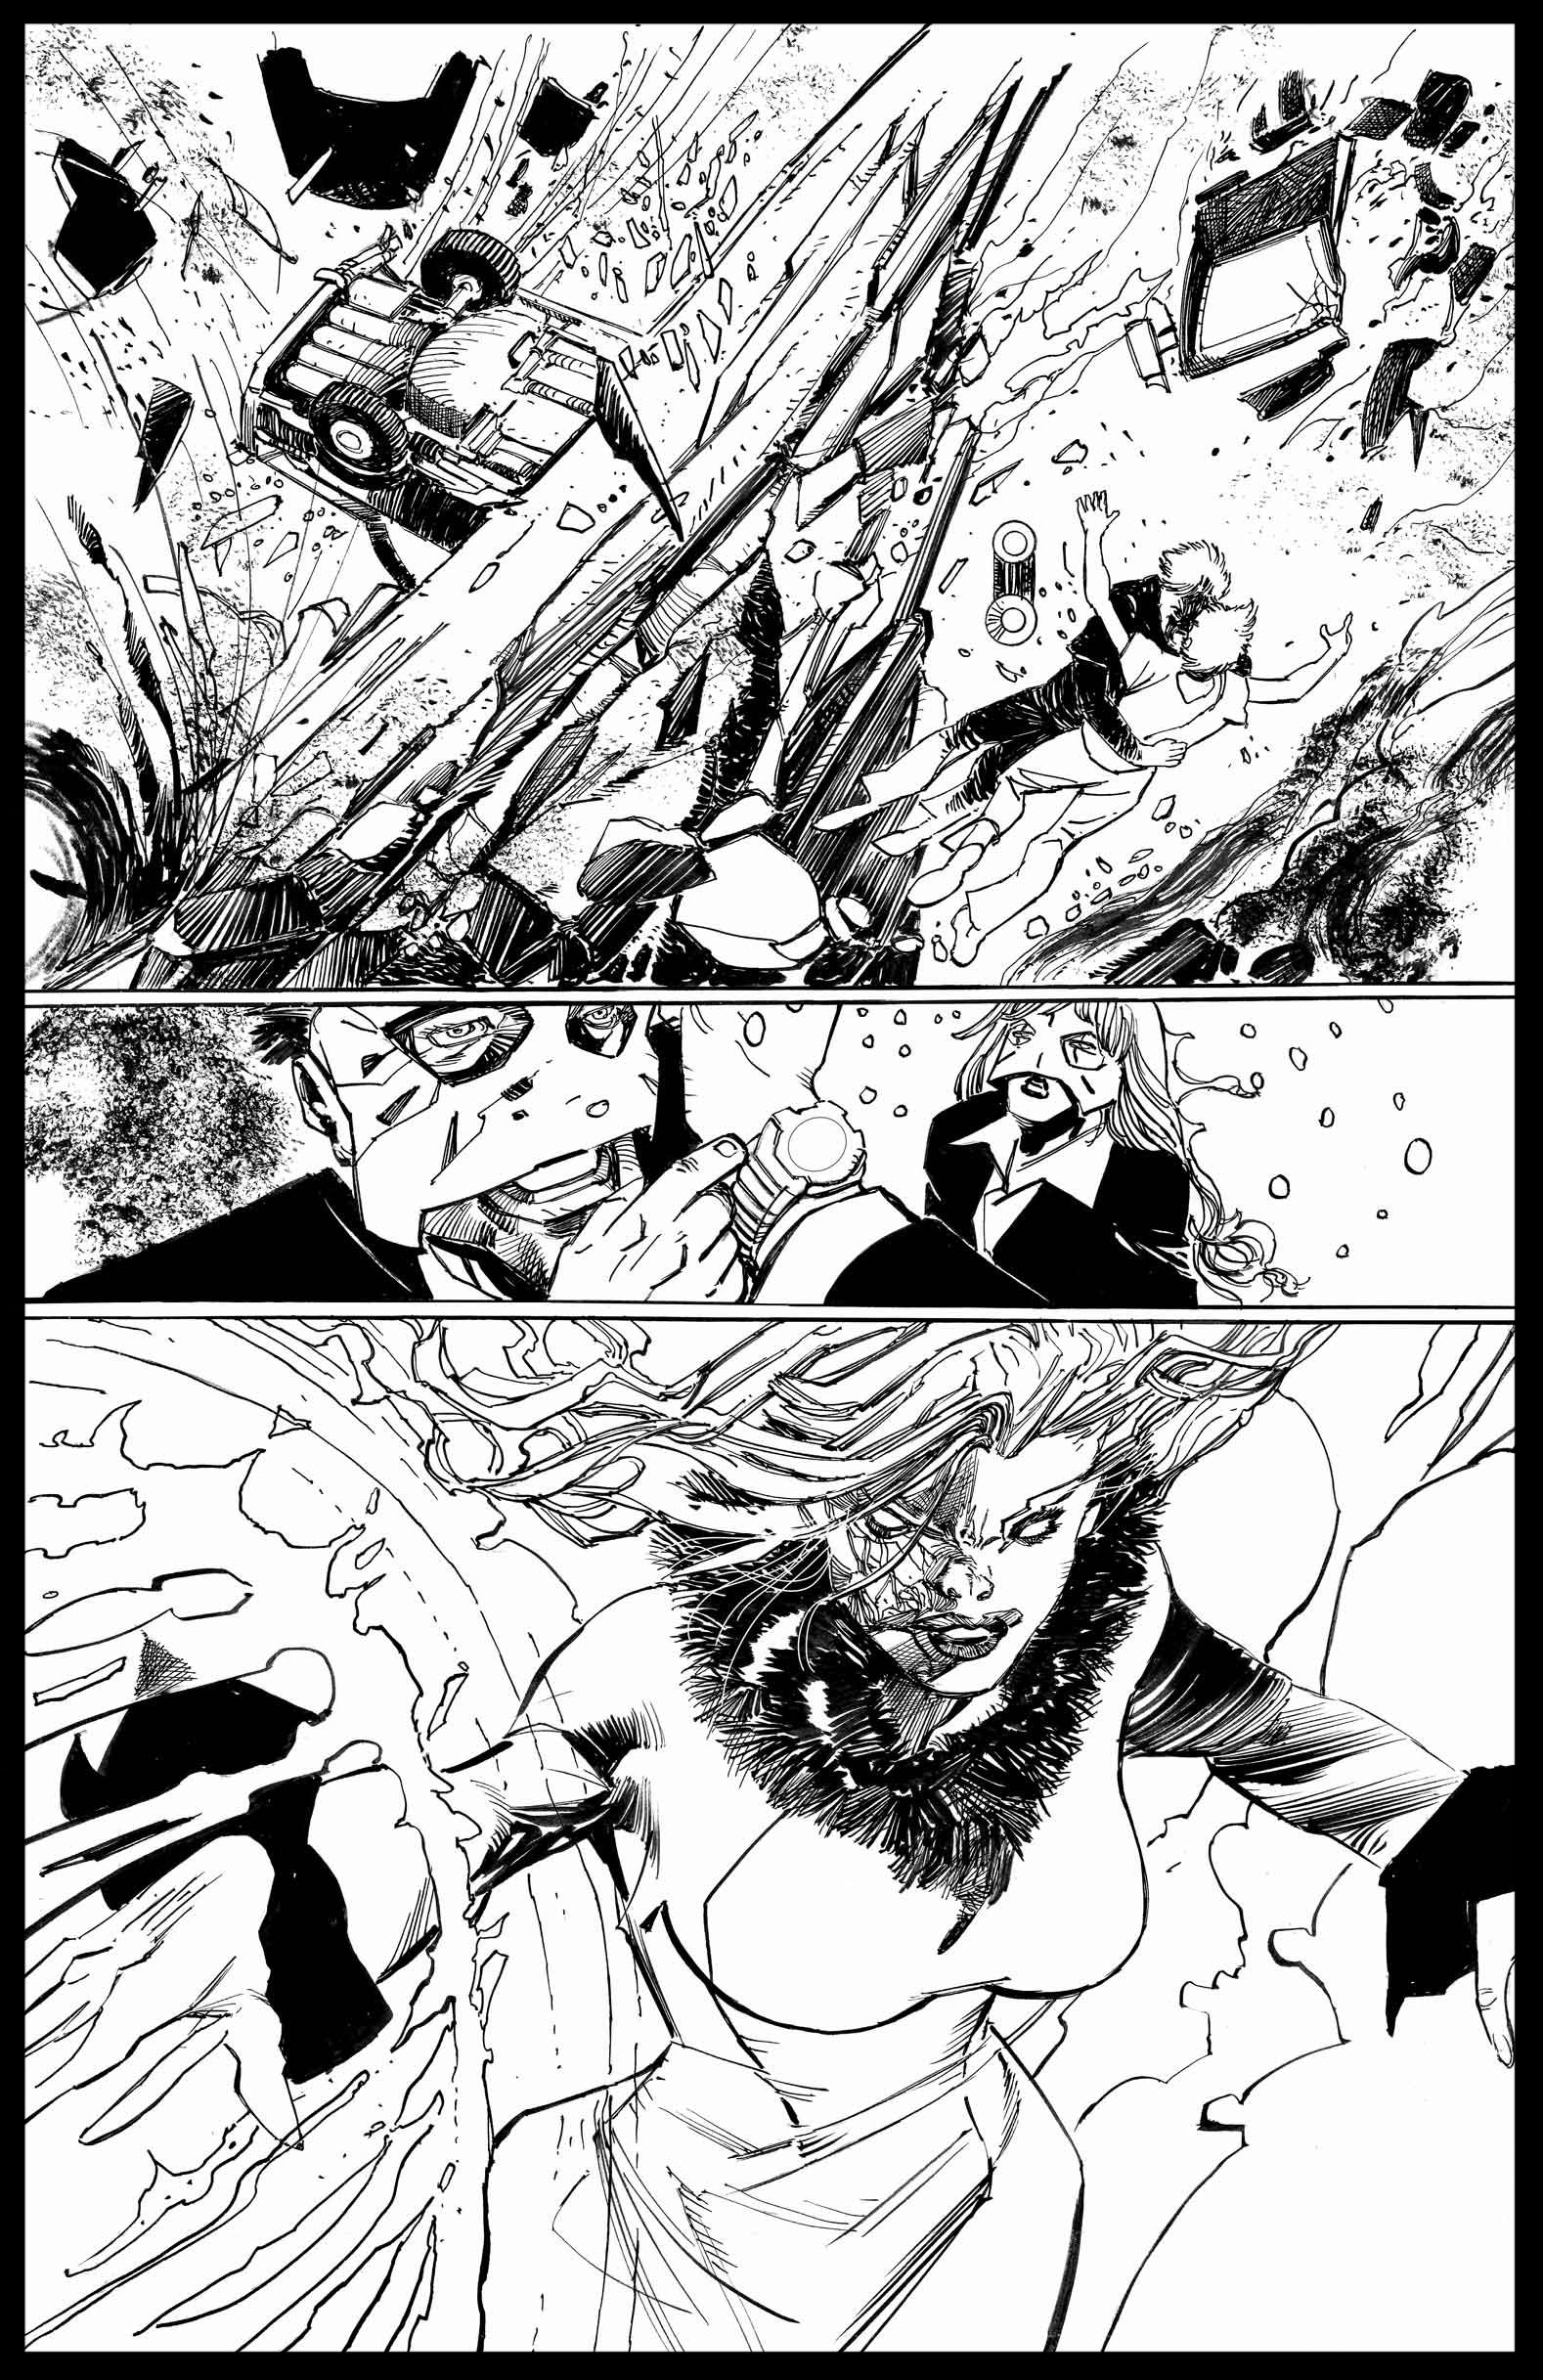 Brimstone #11 - Page 4 - Pencils & Inks